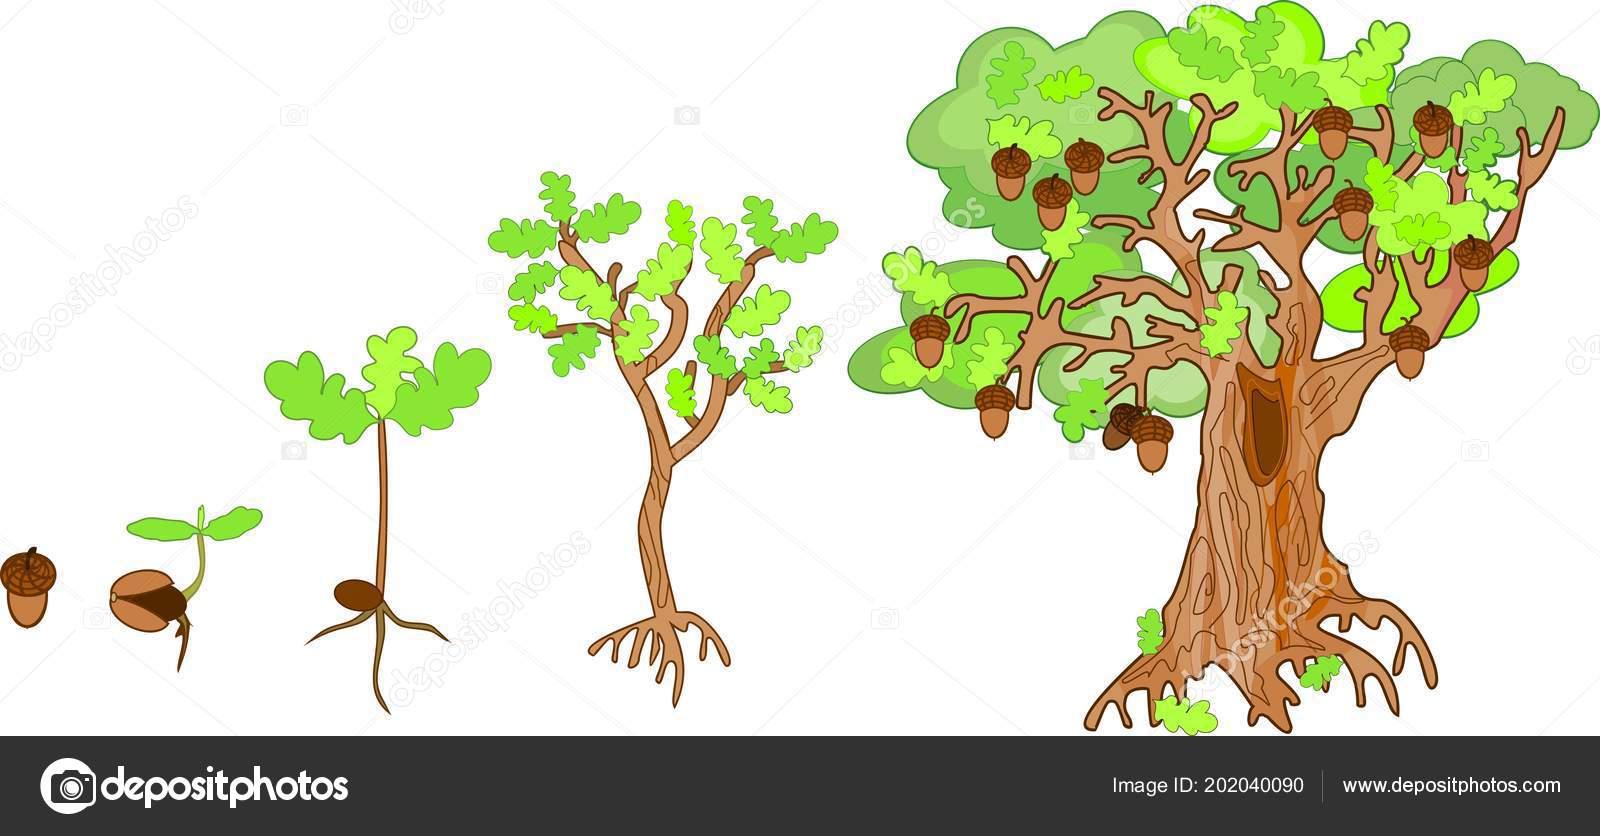 Oak Life Cycle Plant Growin Acorn Mature Oak Tree